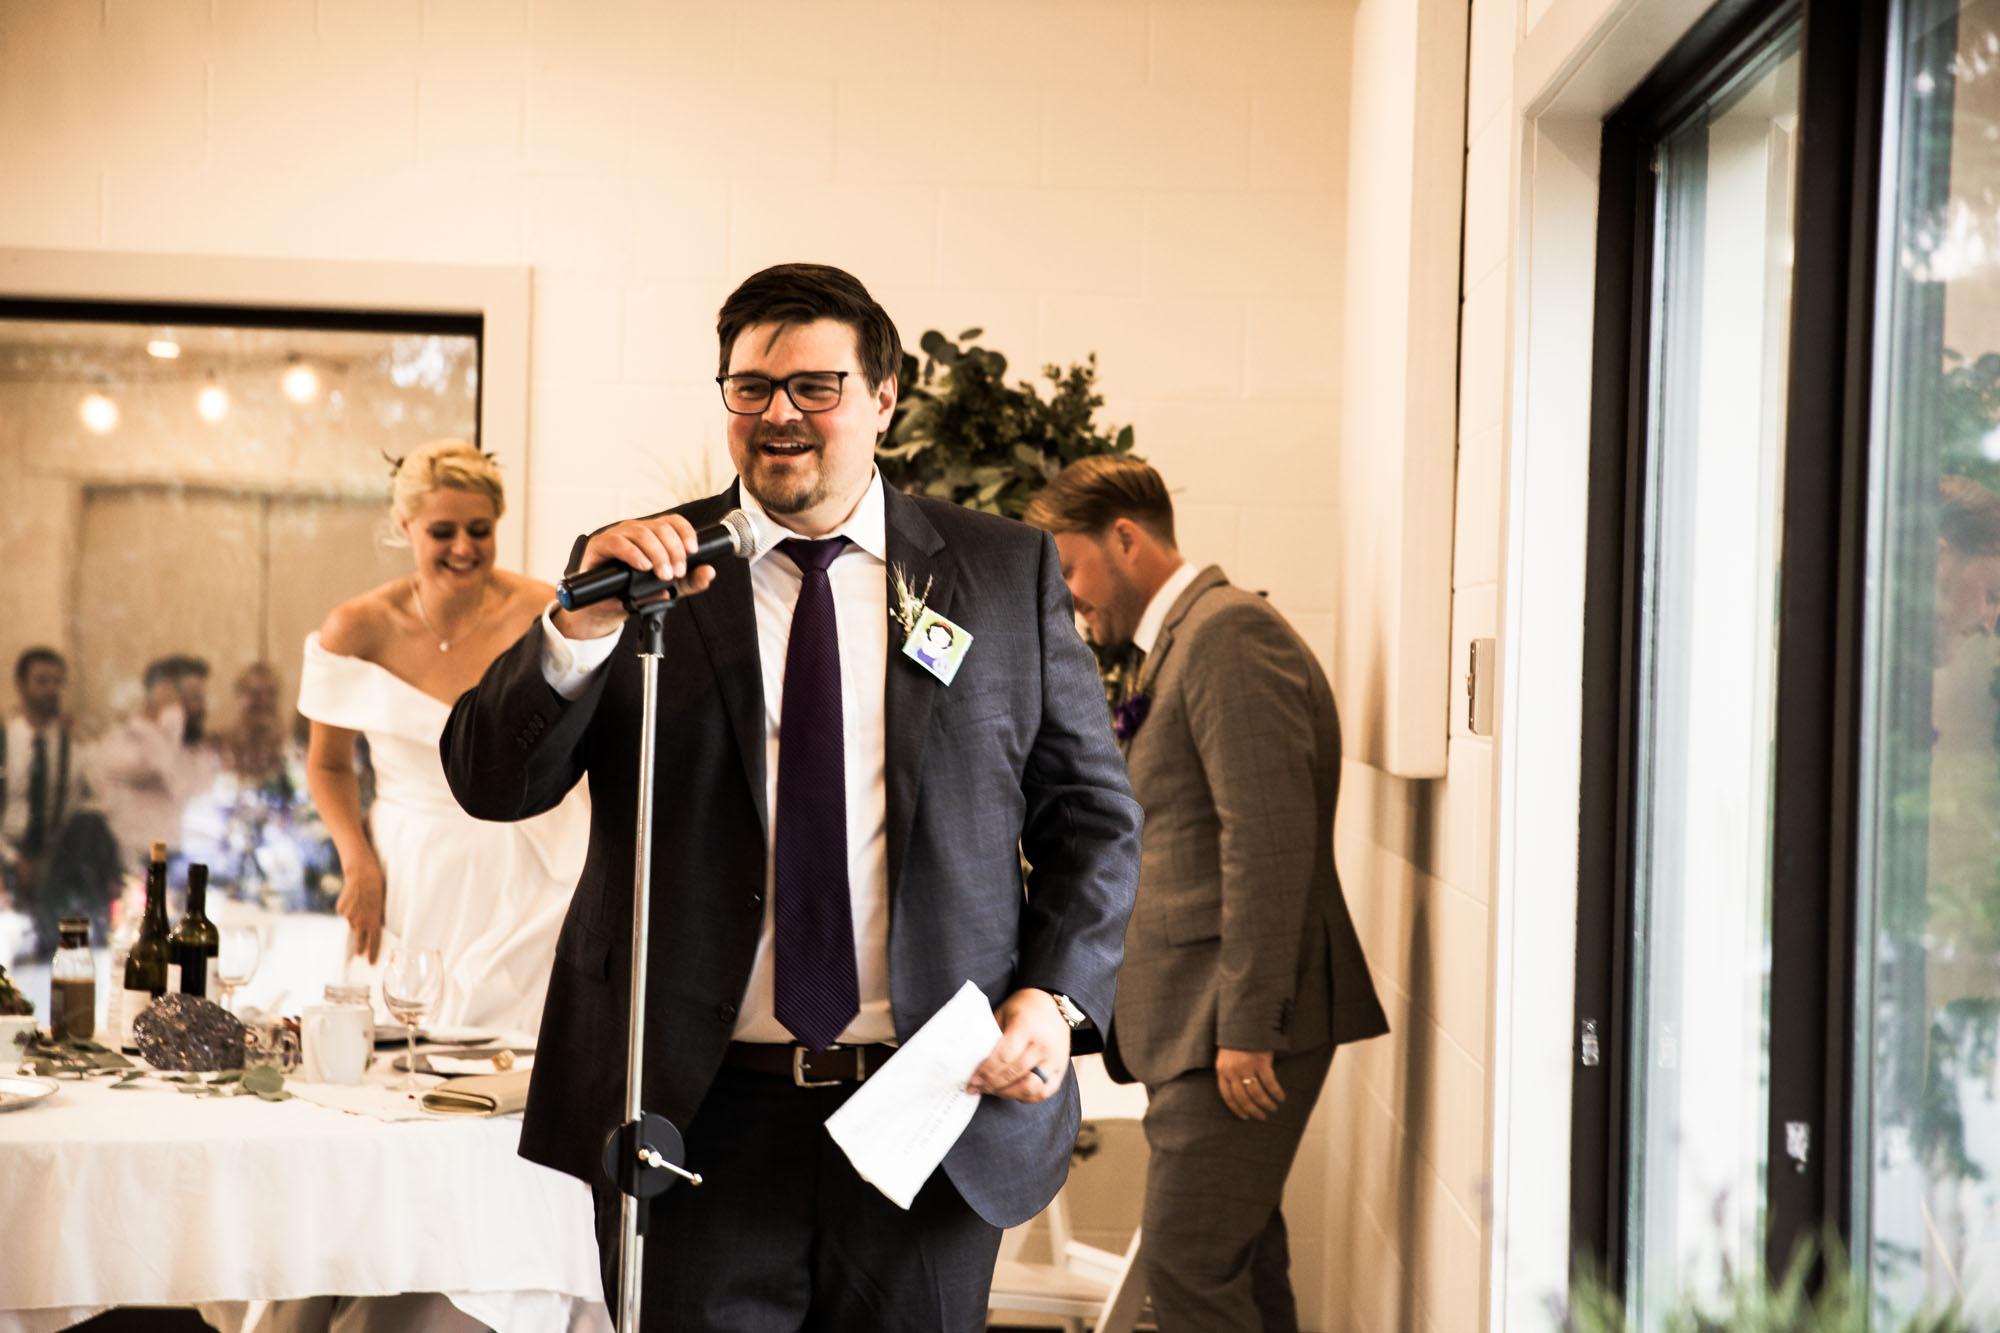 Calgary wedding photographer, the reception